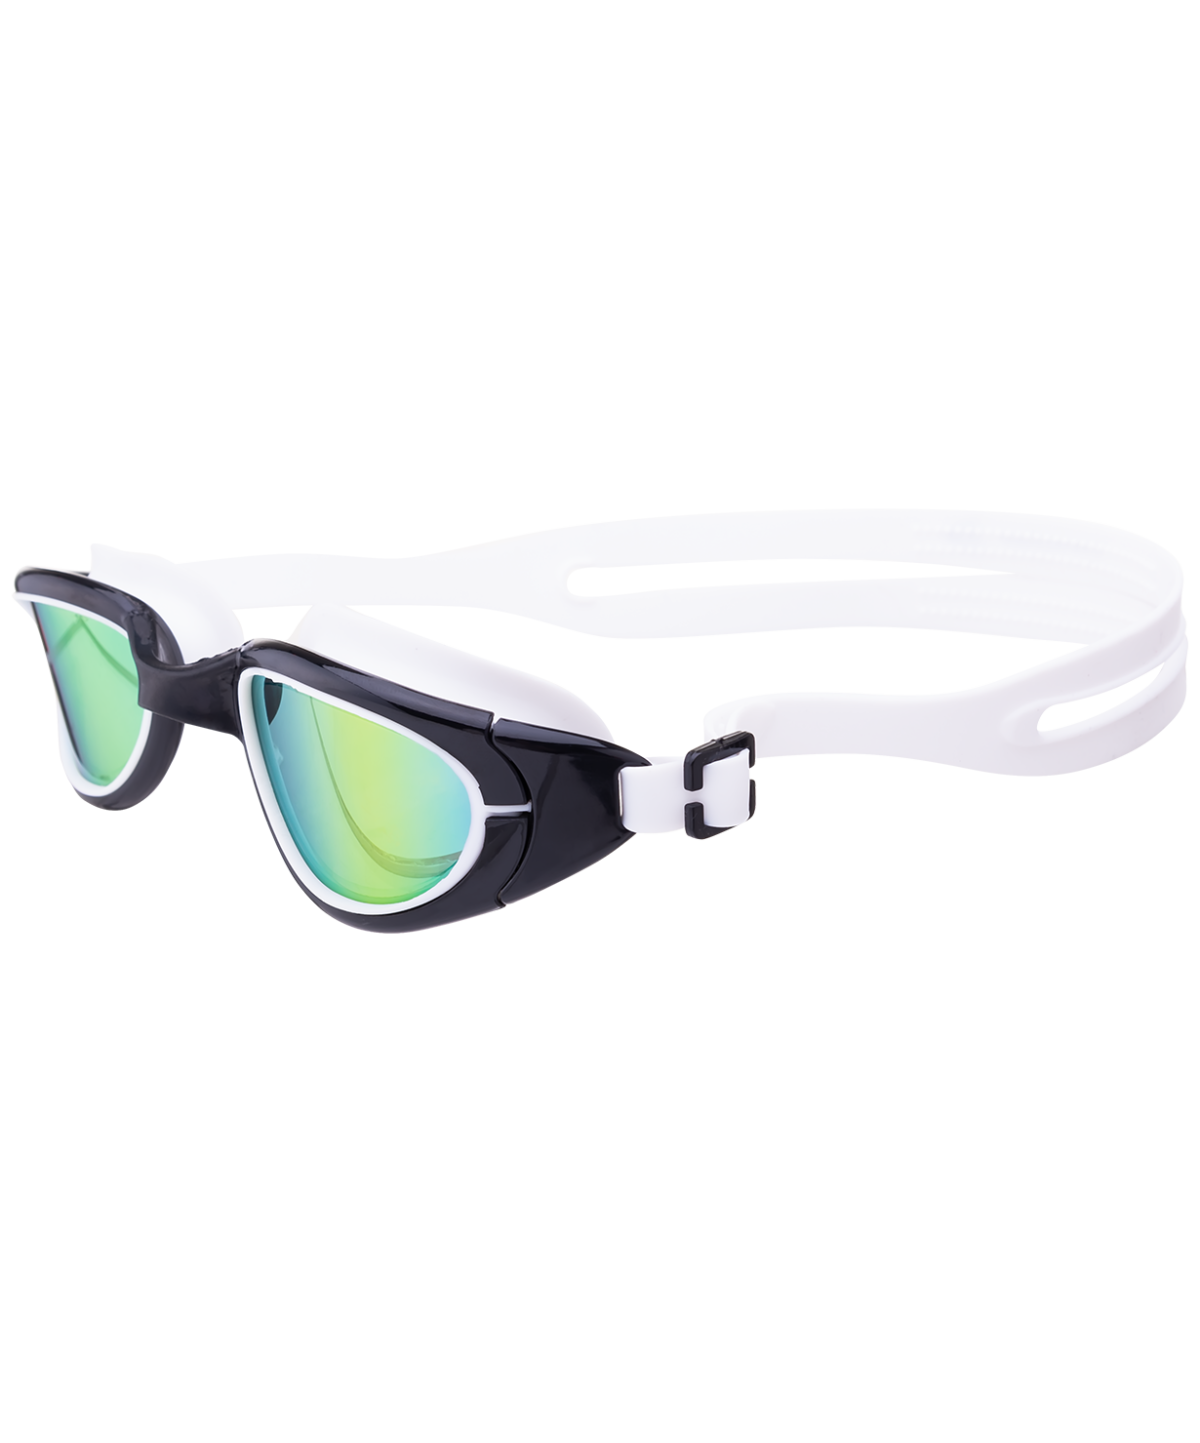 LONGSAIL Blaze Mirror Очки для плавания  L011707 - 1